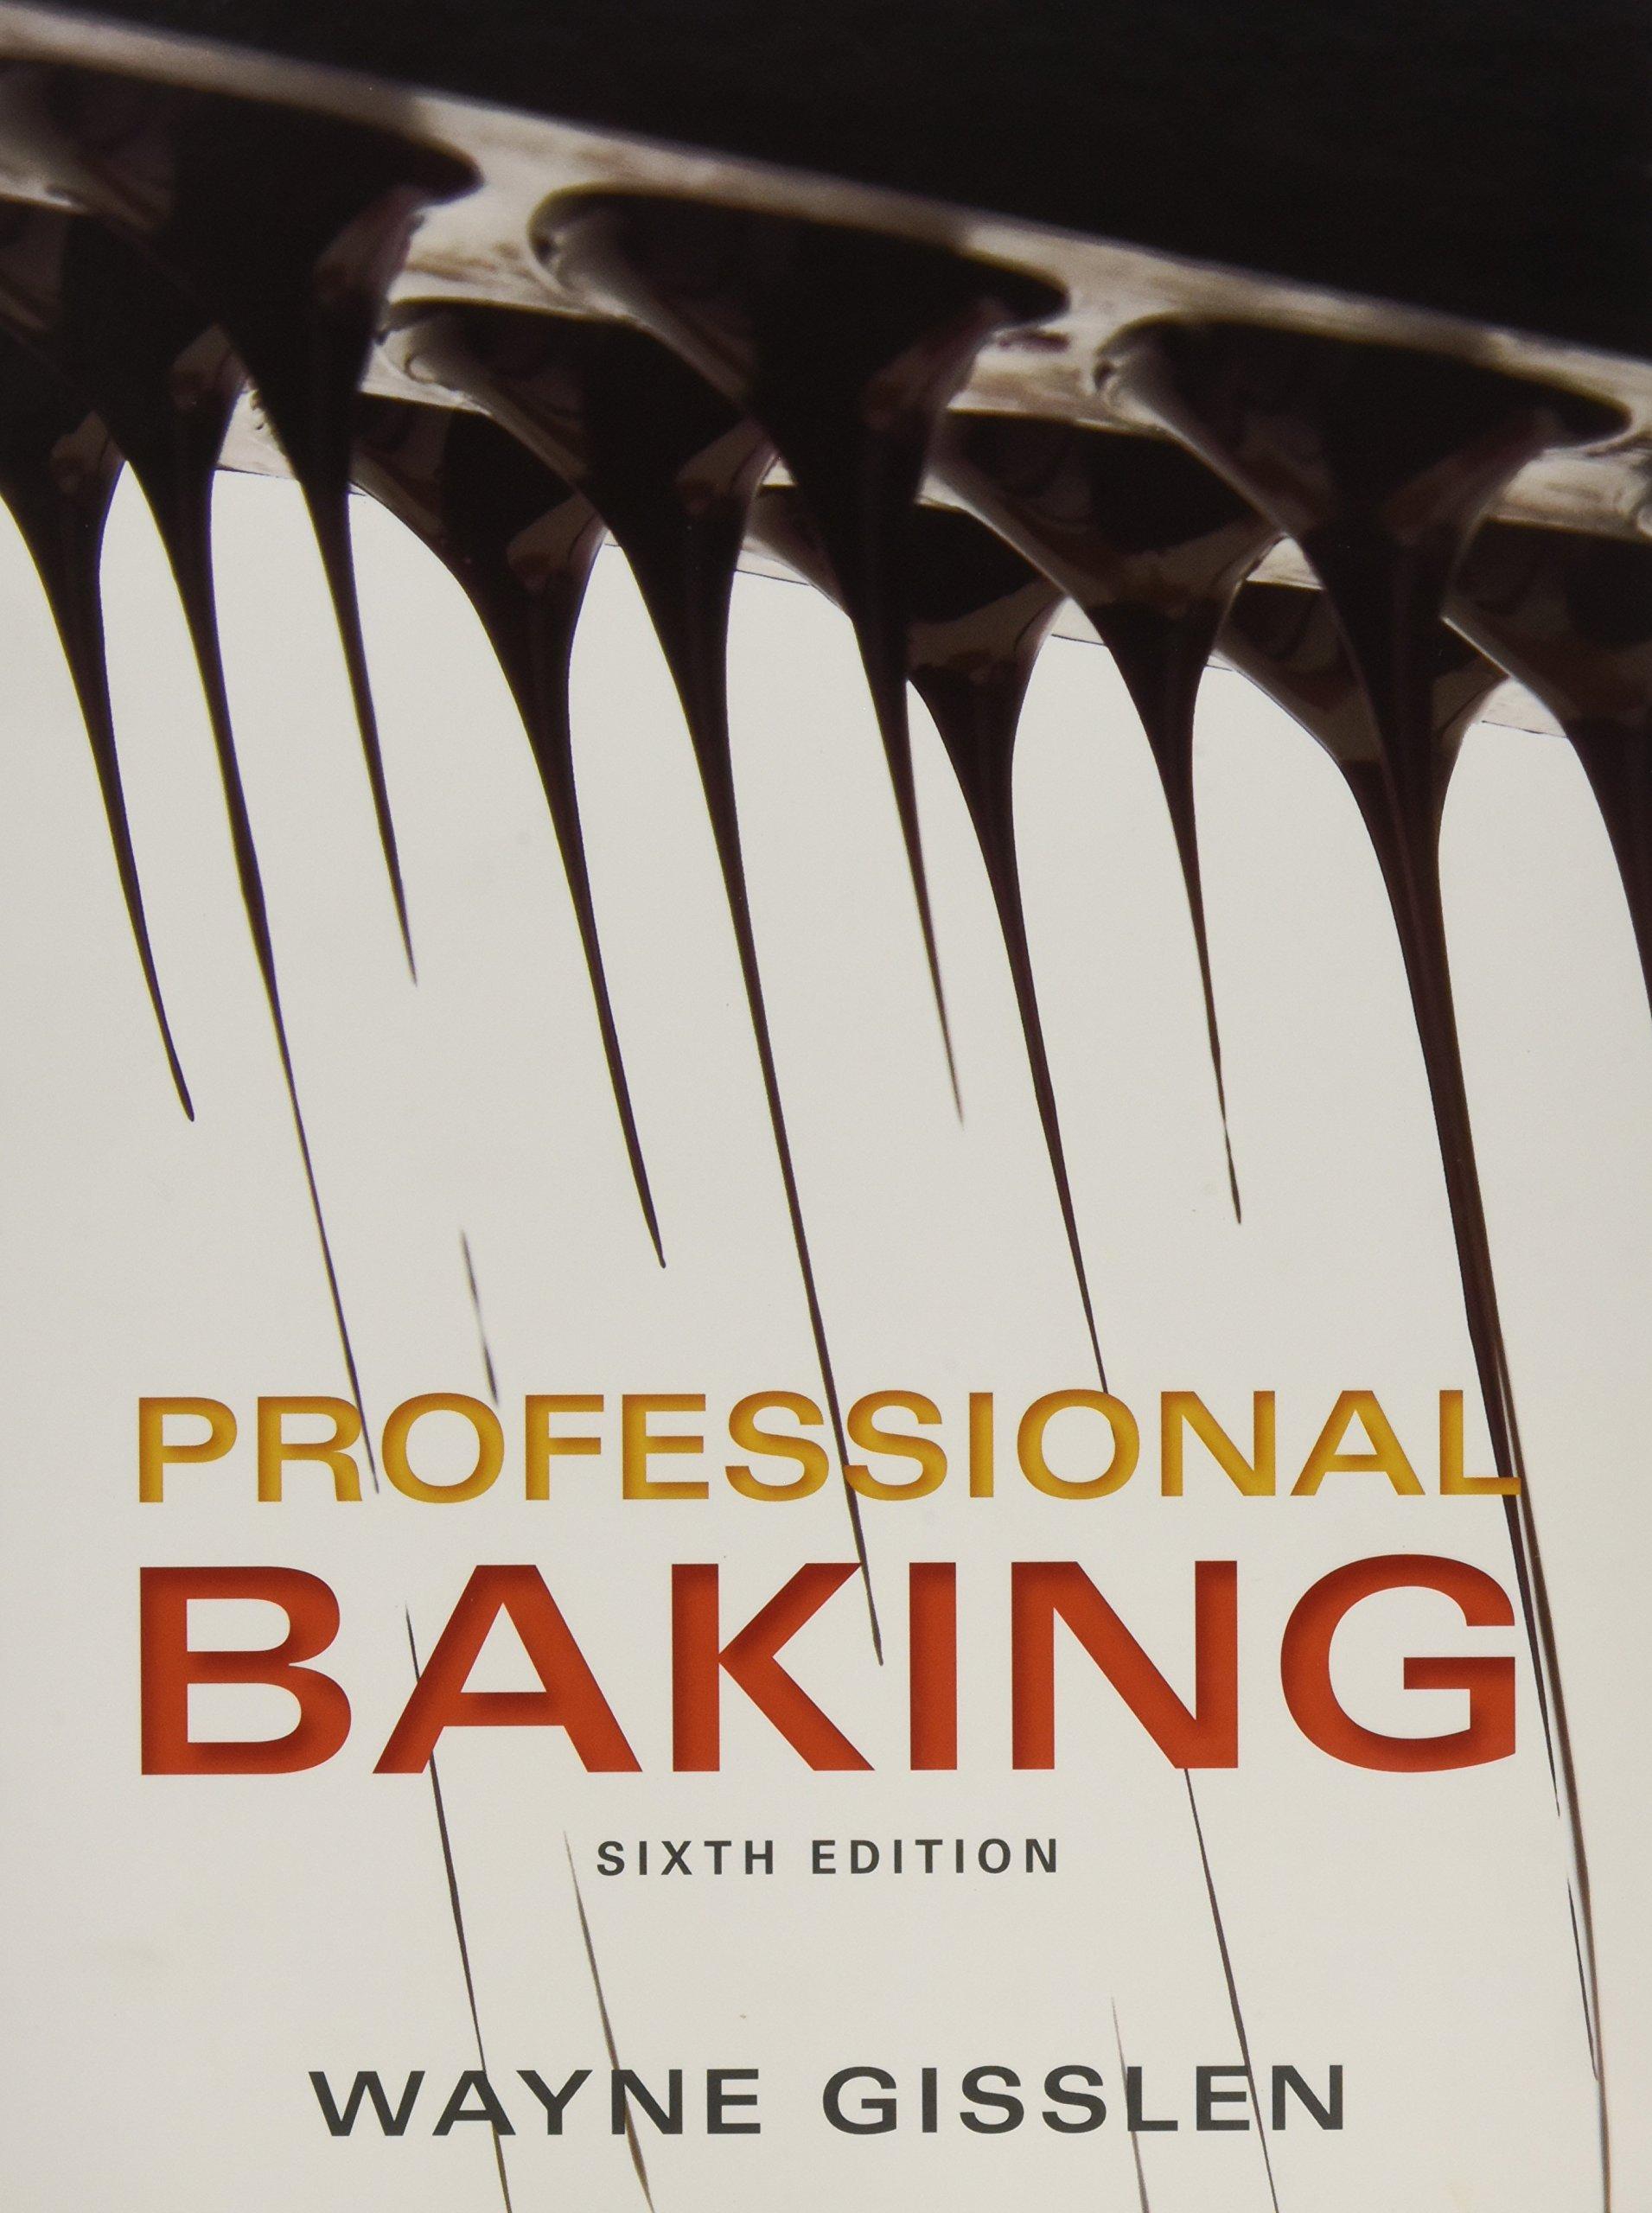 Professional Baking 6e with Professional Baking Method Card Package Set:  Wayne Gisslen: 9781118254363: Books - Amazon.ca